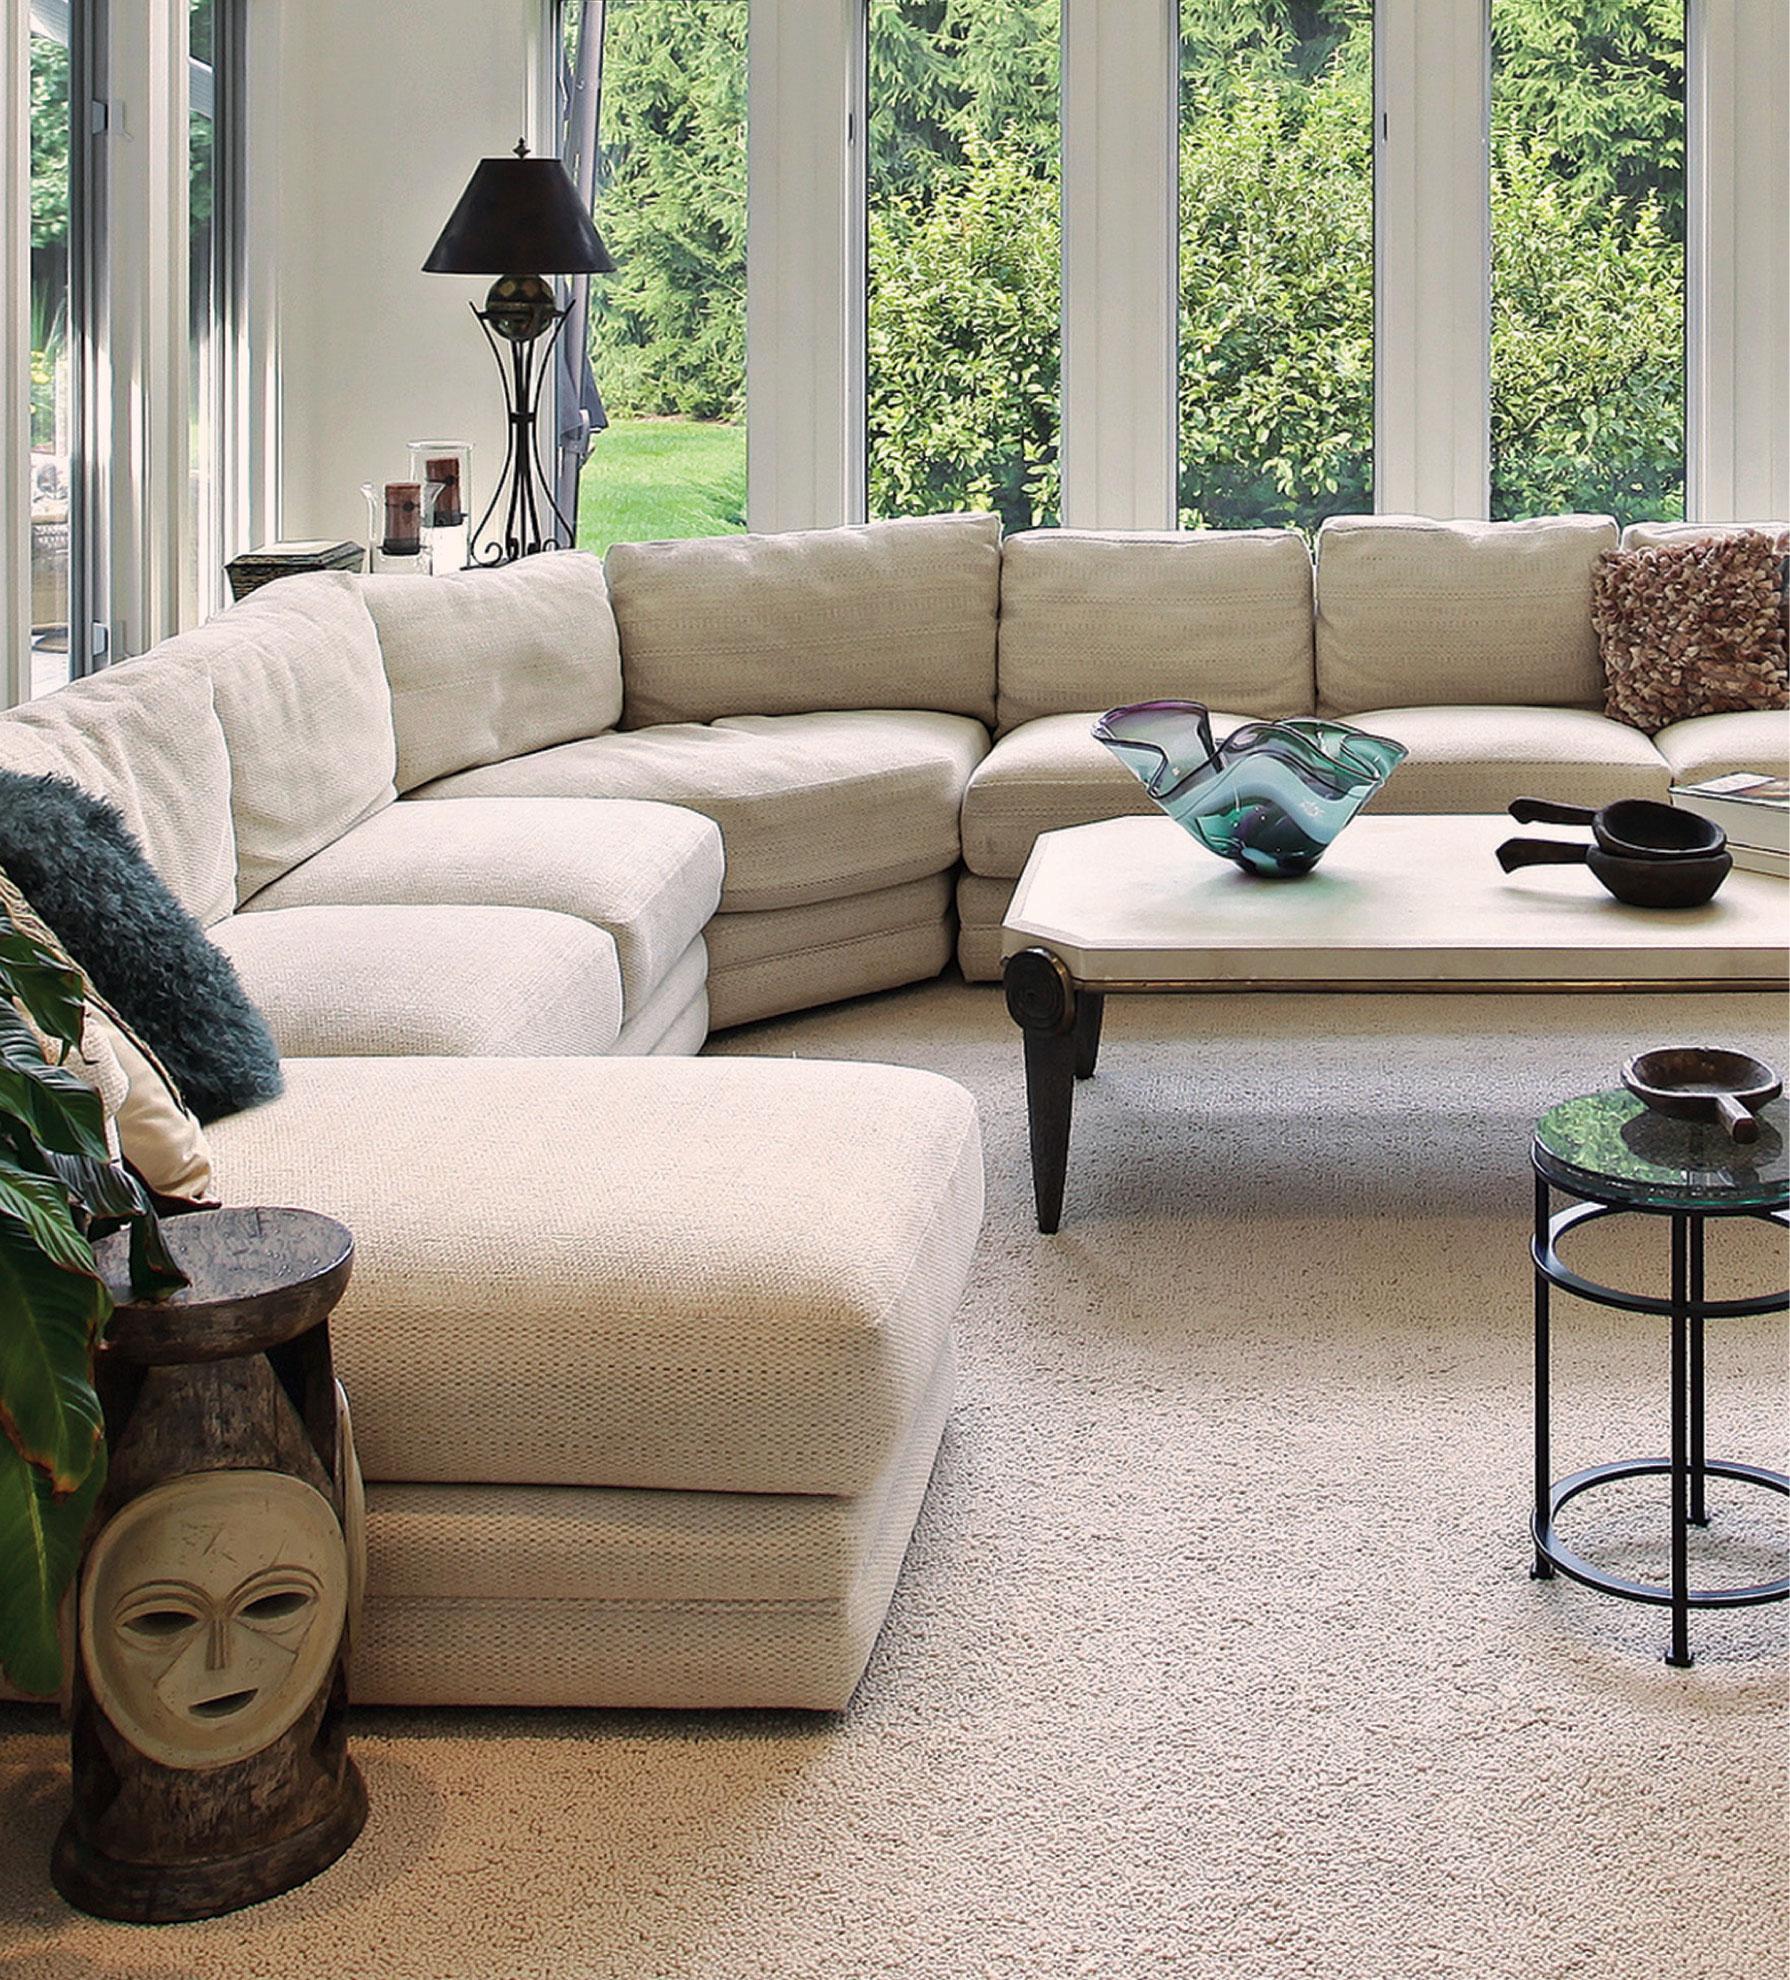 Leather Sofas Preston Lancashire: Carpet Cleaning Preston